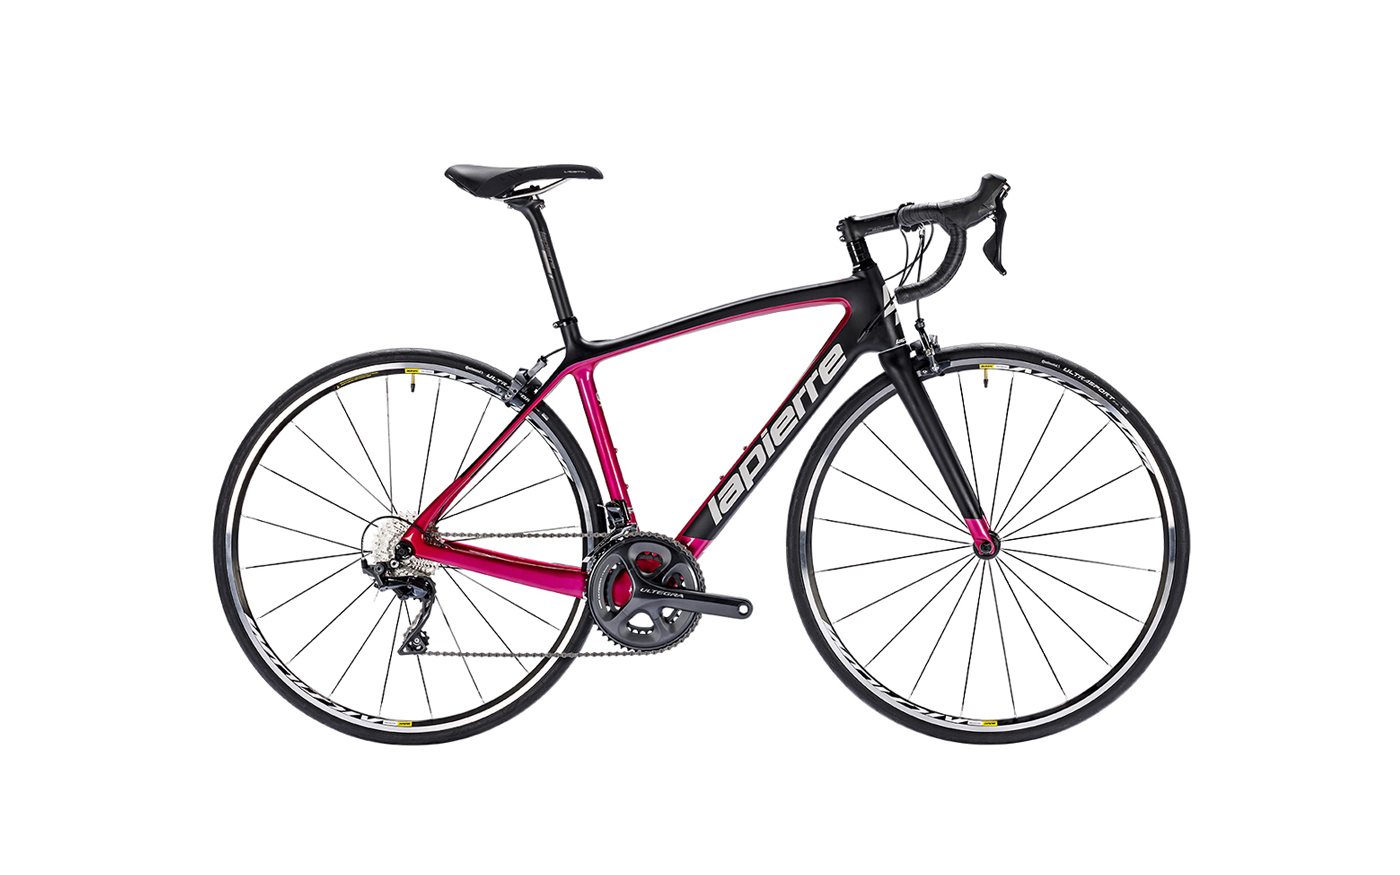 Bicykel LAPIERRE SENSIUM 600 W CP 2018